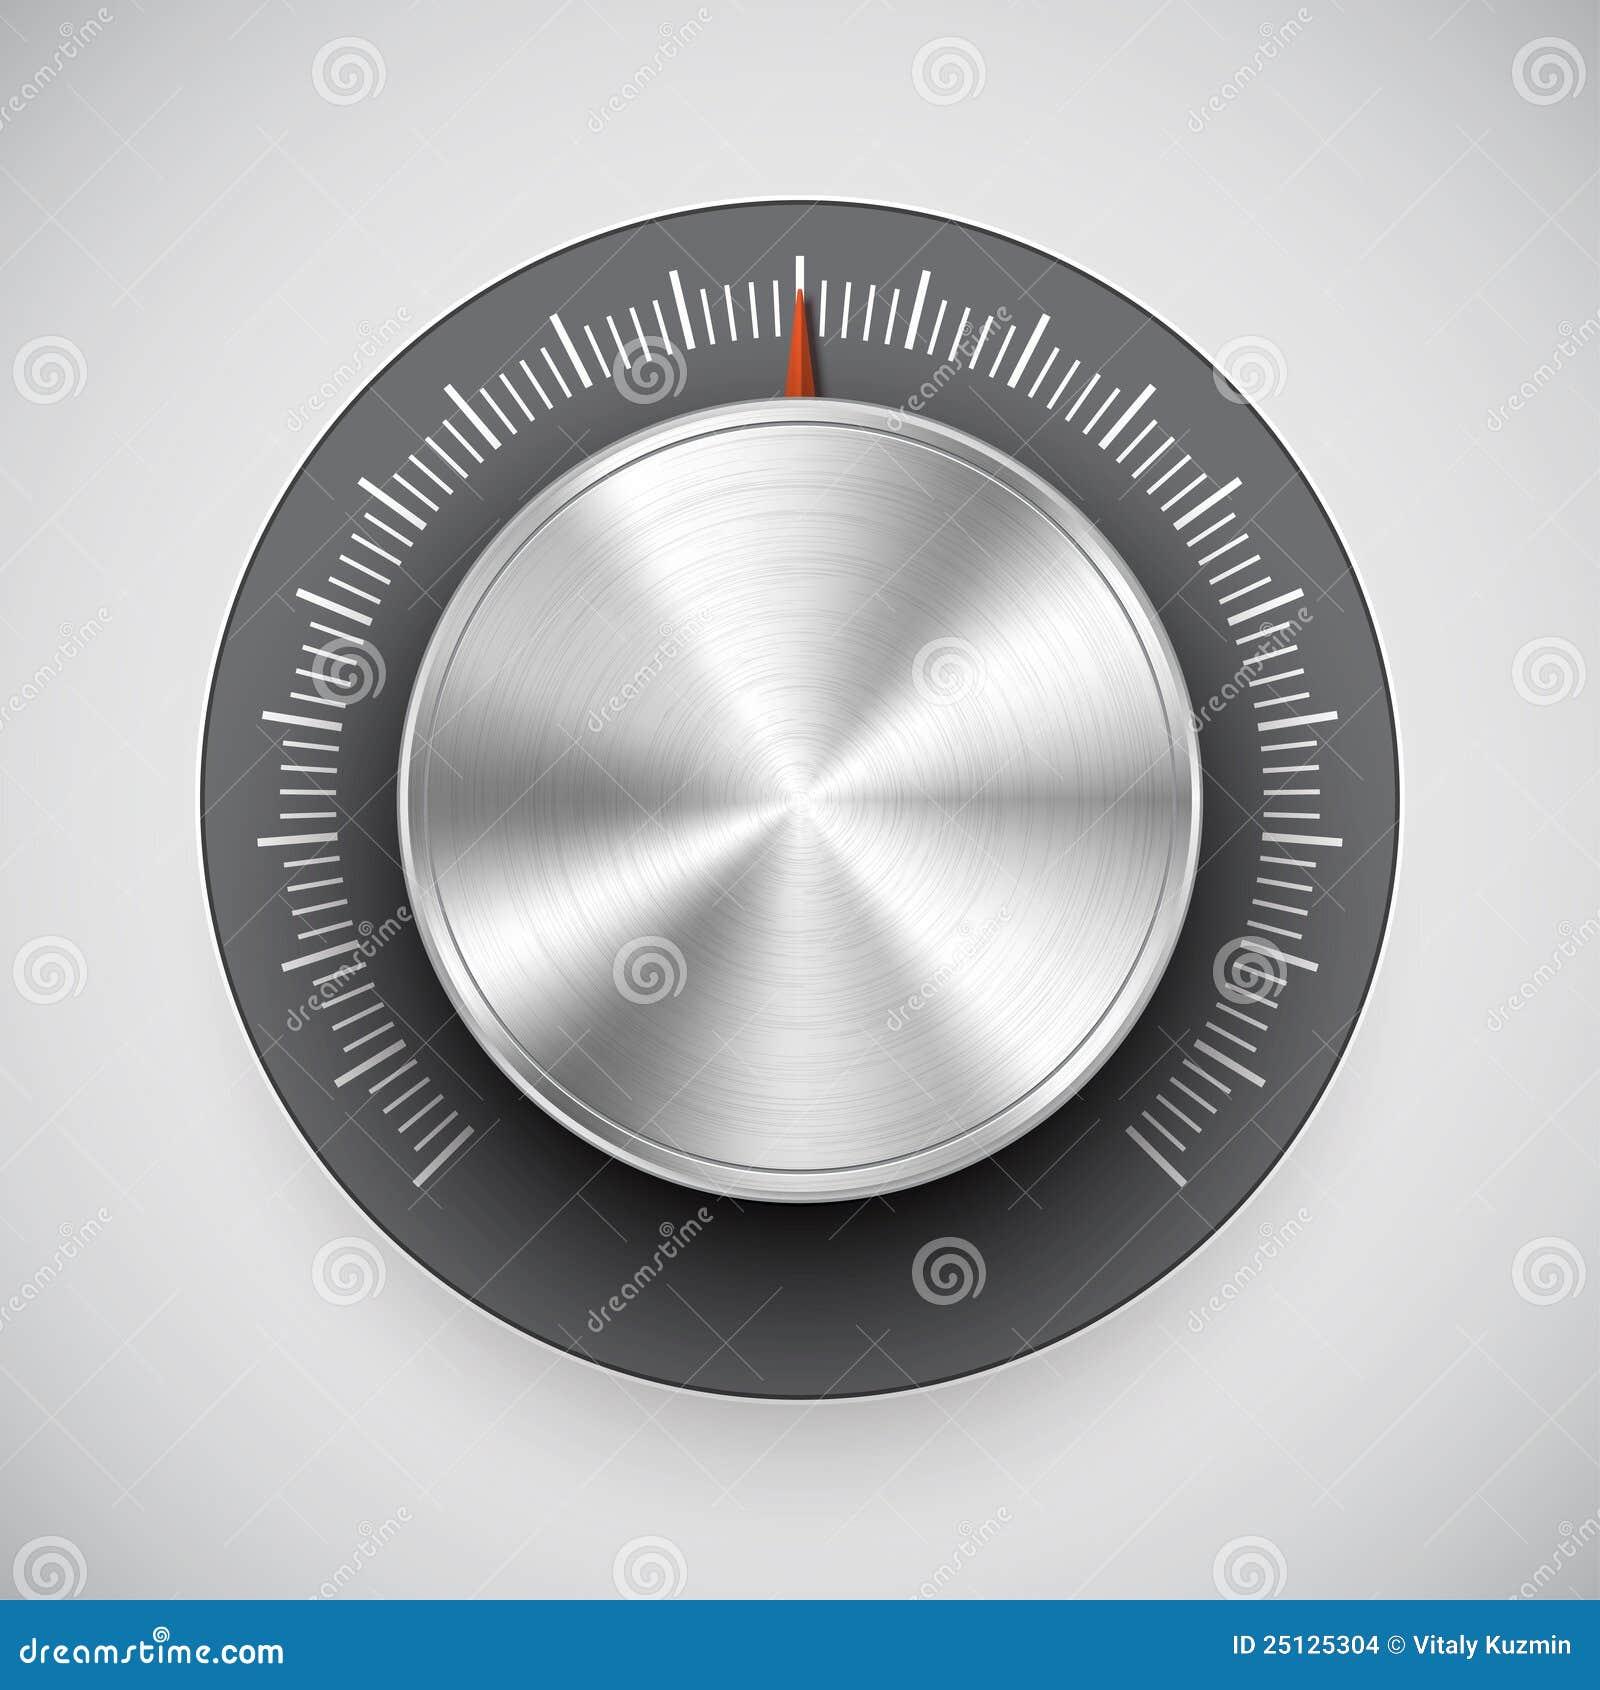 Volume Control Button : Chrome volume knob button music tuner stock vector